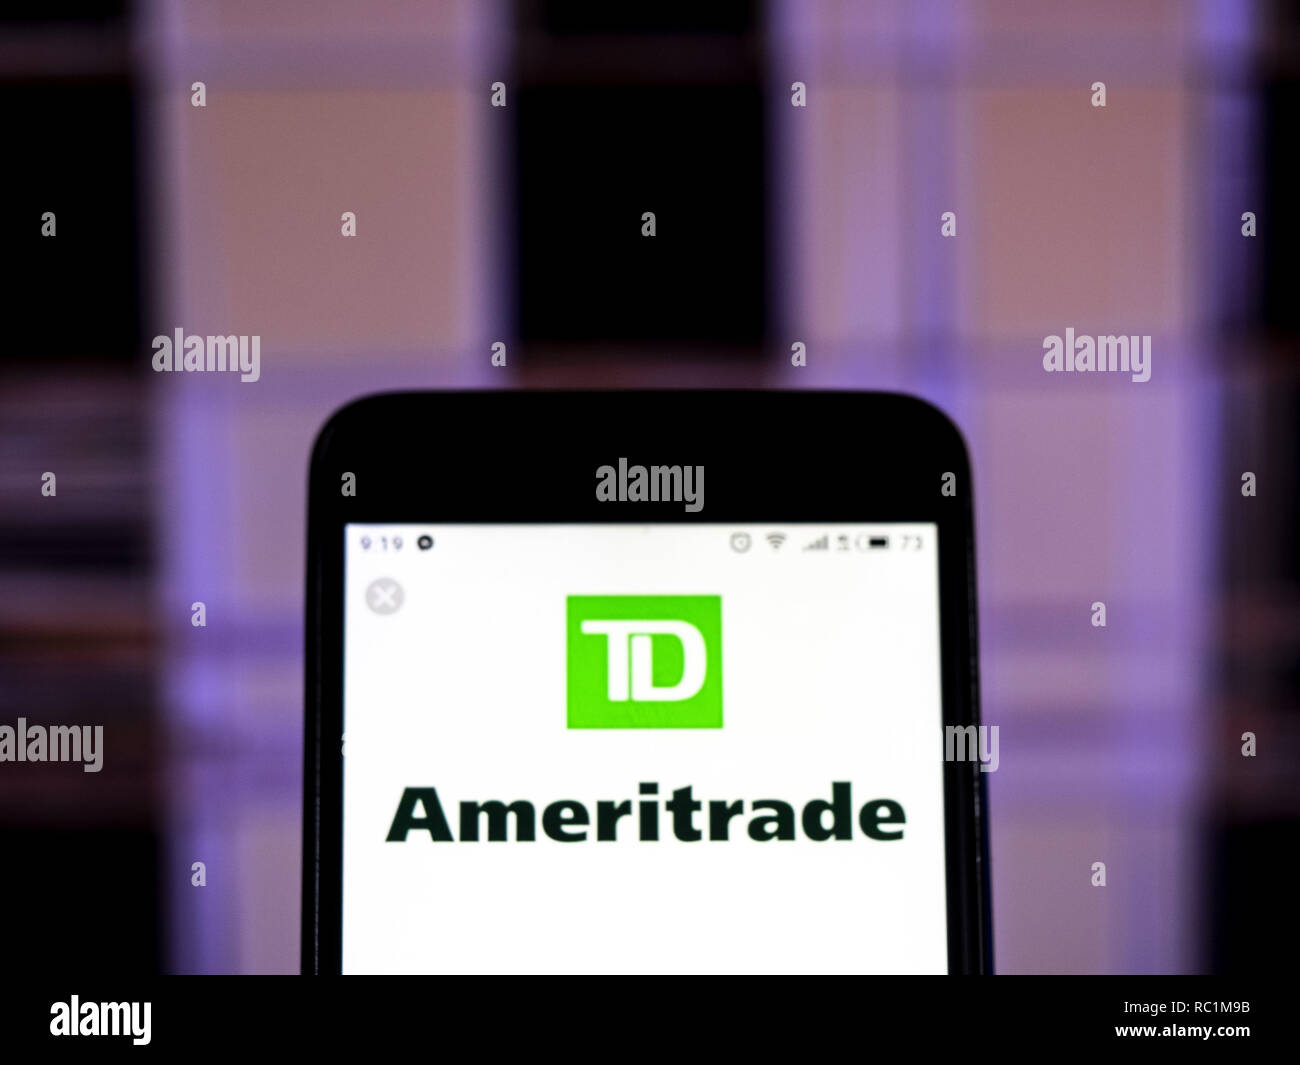 Td Ameritrade Mobile Stock Photos & Td Ameritrade Mobile Stock